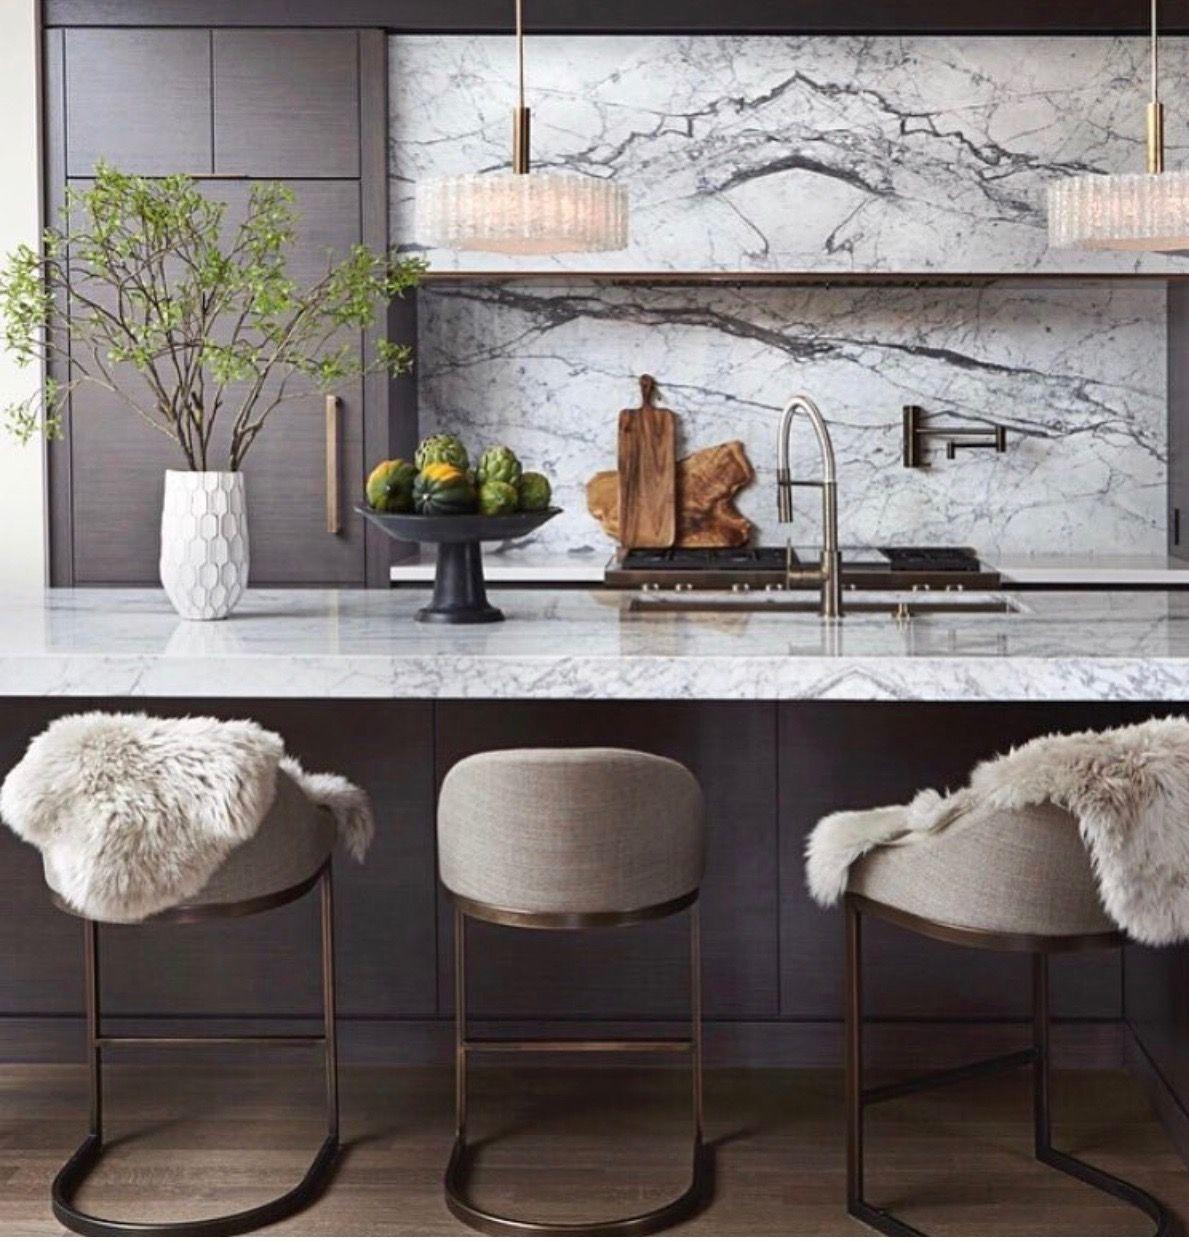 9 Kitchen Bar Stools   Kitchen bar stools make a wonderful ...